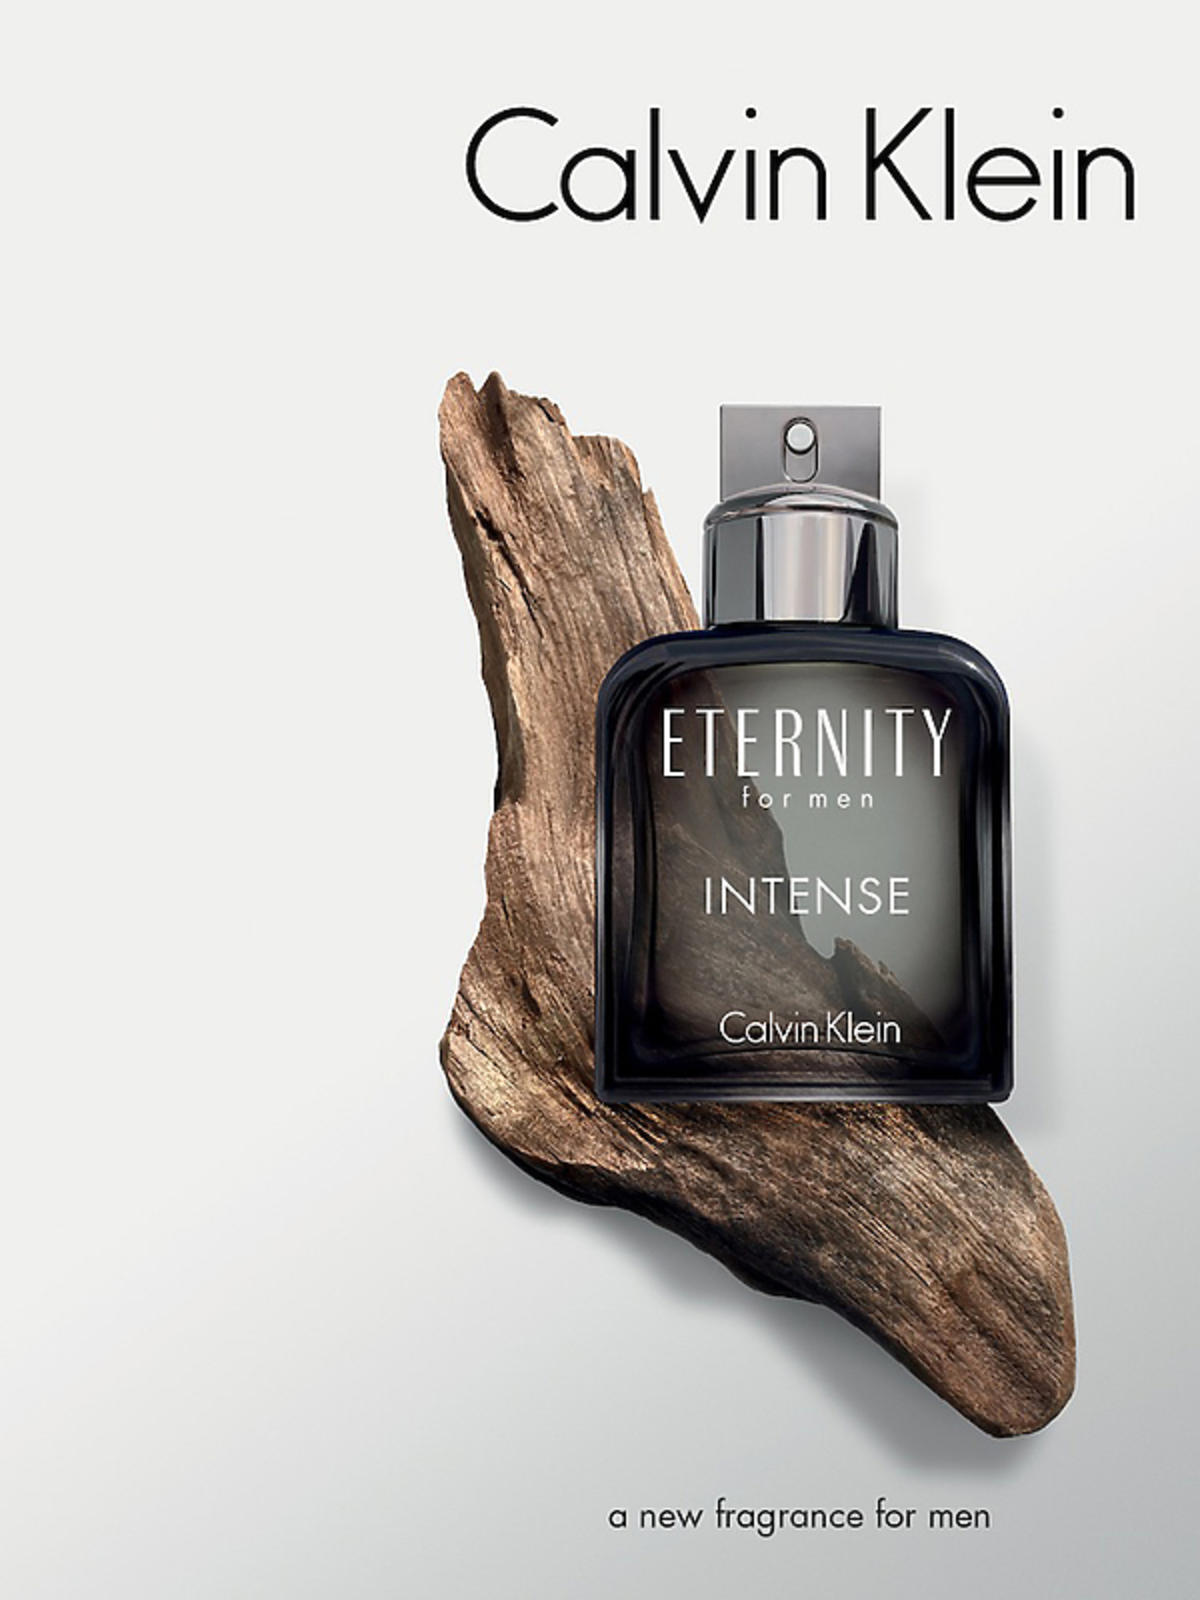 Nowy zapach od Calvina Kleina: Eternity Intense Men, EDT, cena: 289 zł /100 ml